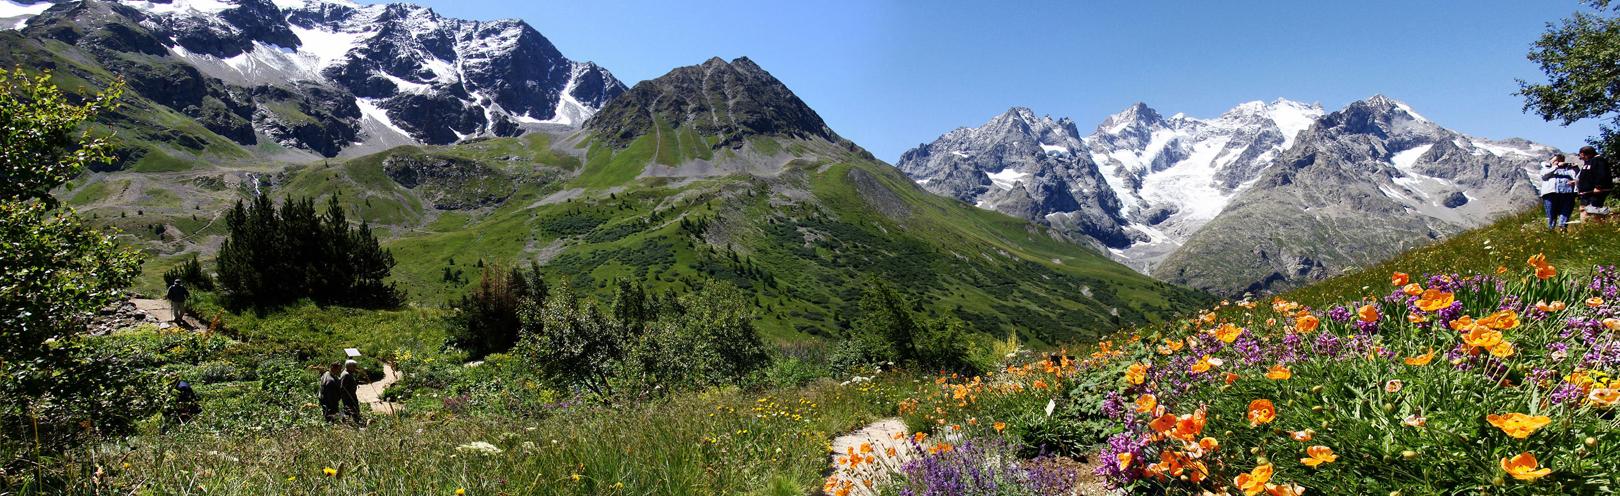 32  Jardin Alpin du Lautaret